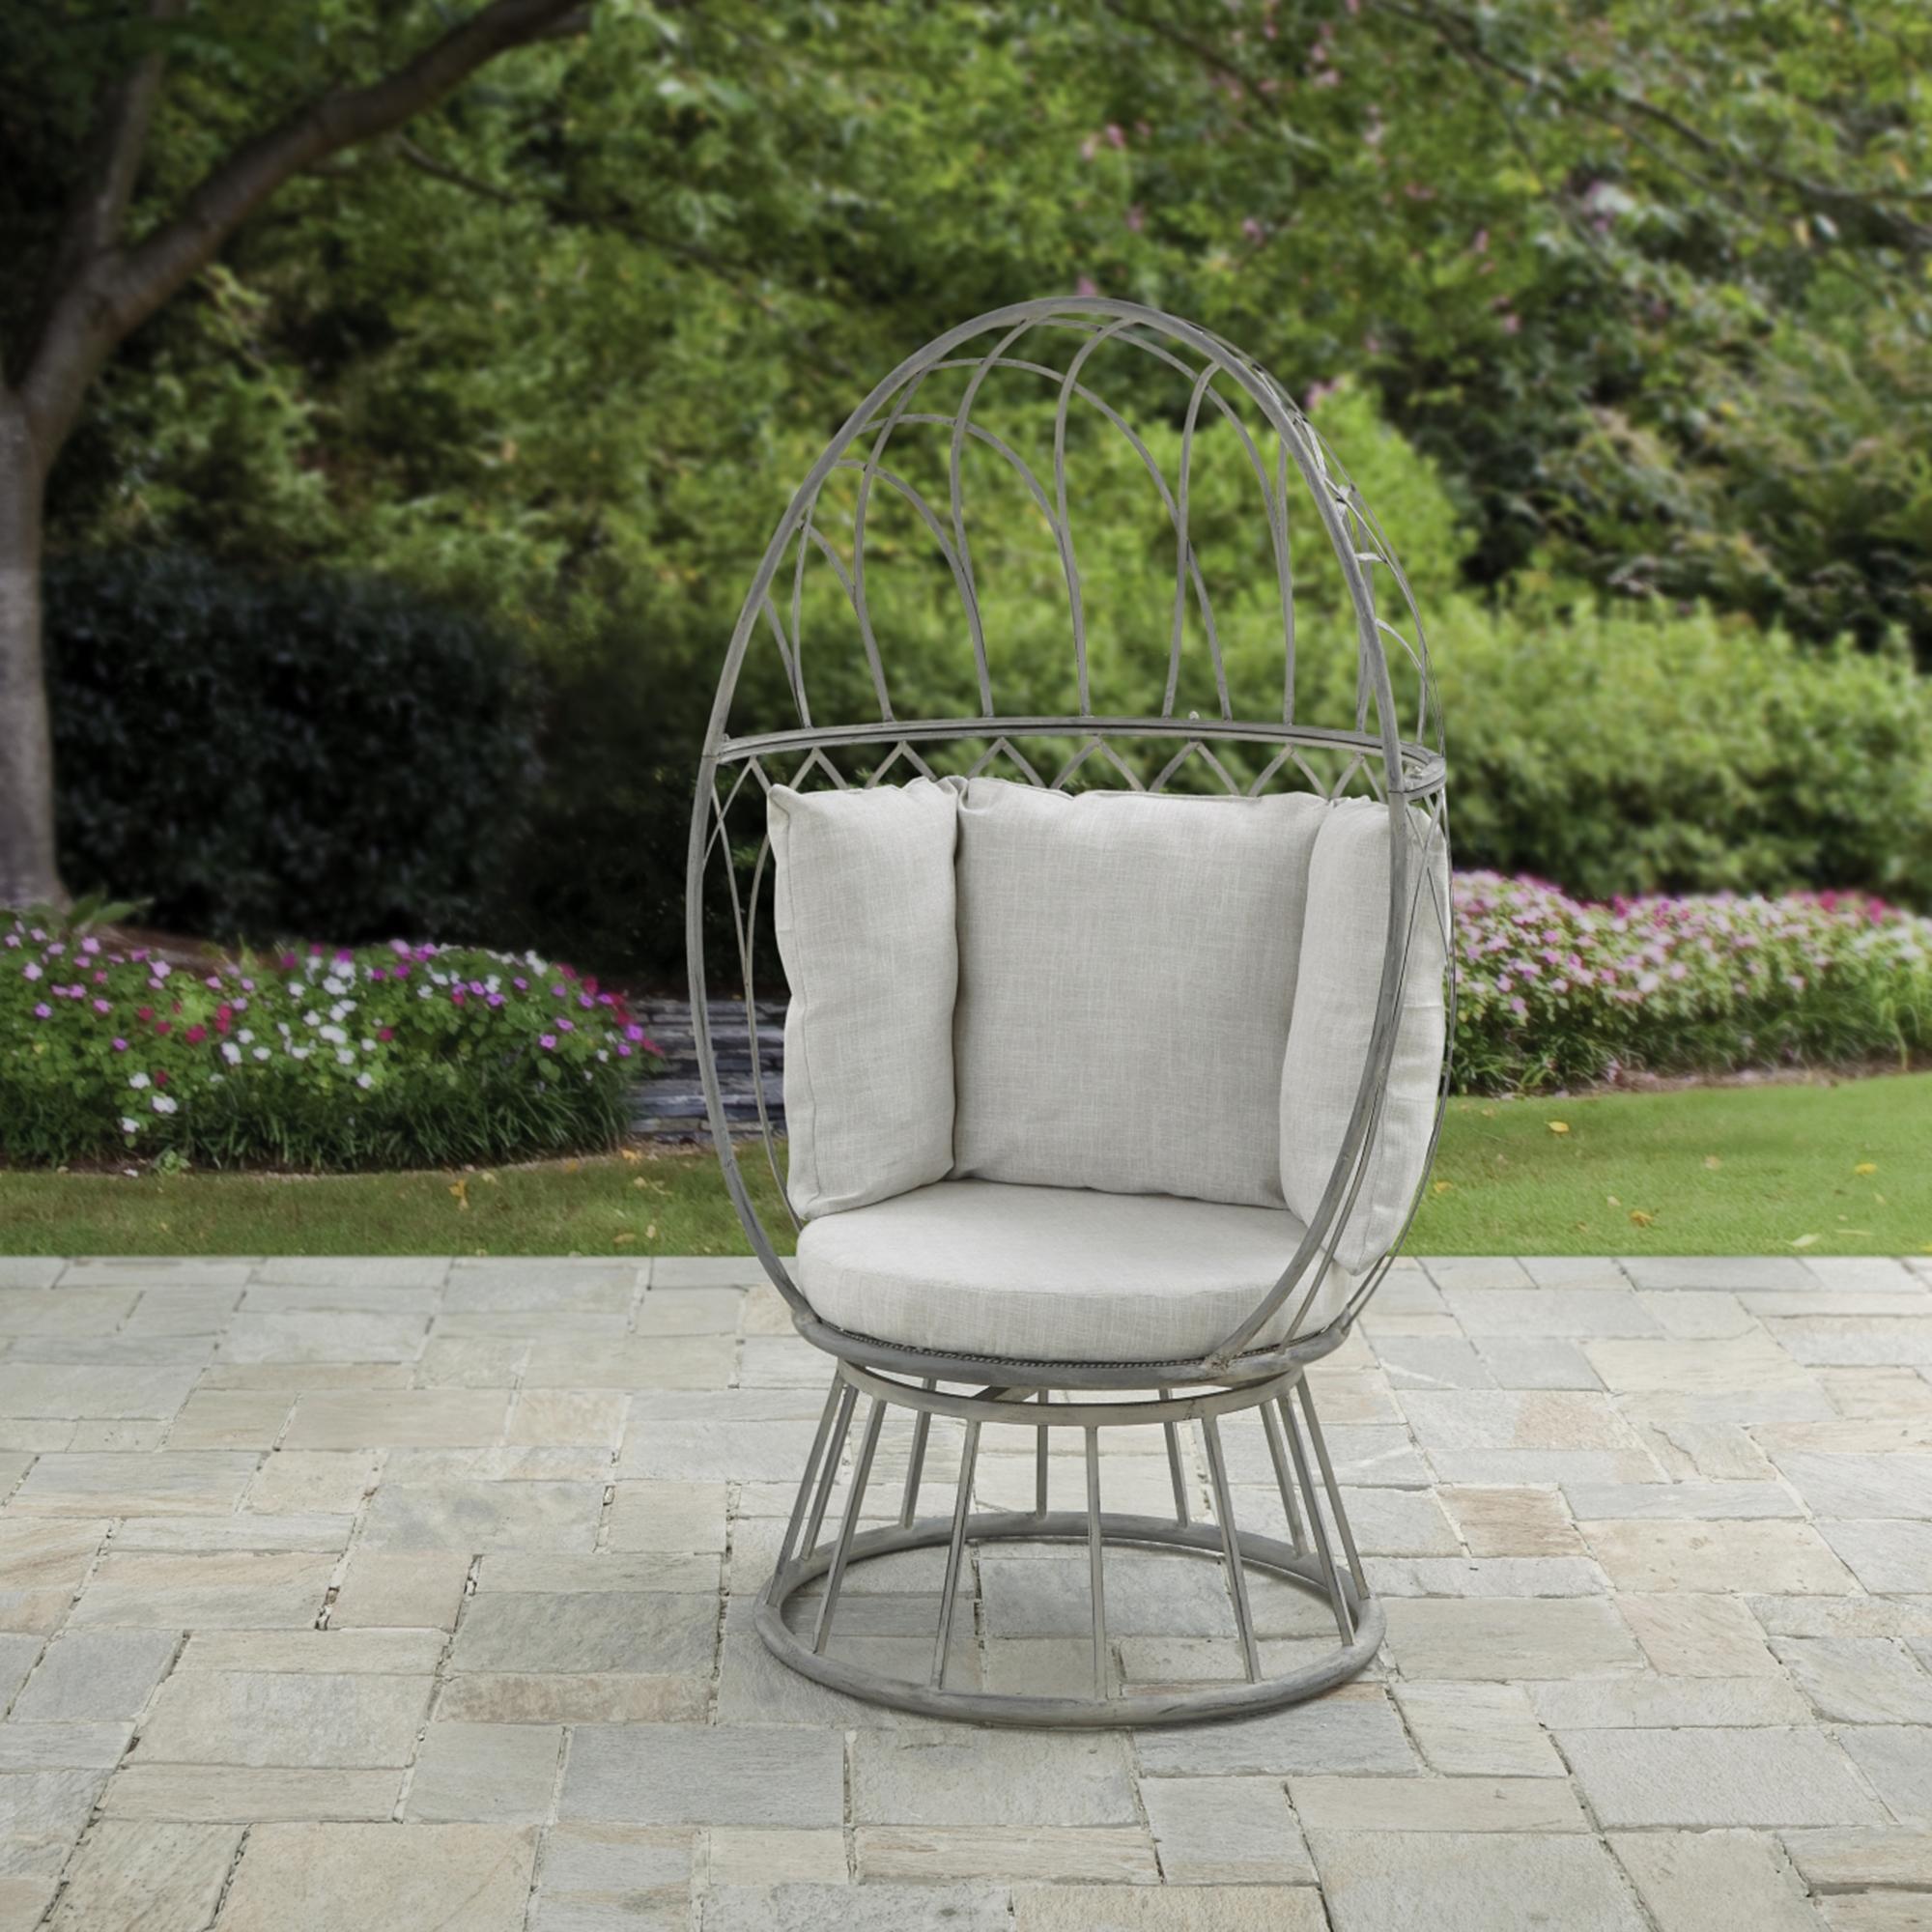 Garden chairs in your spacious gardens